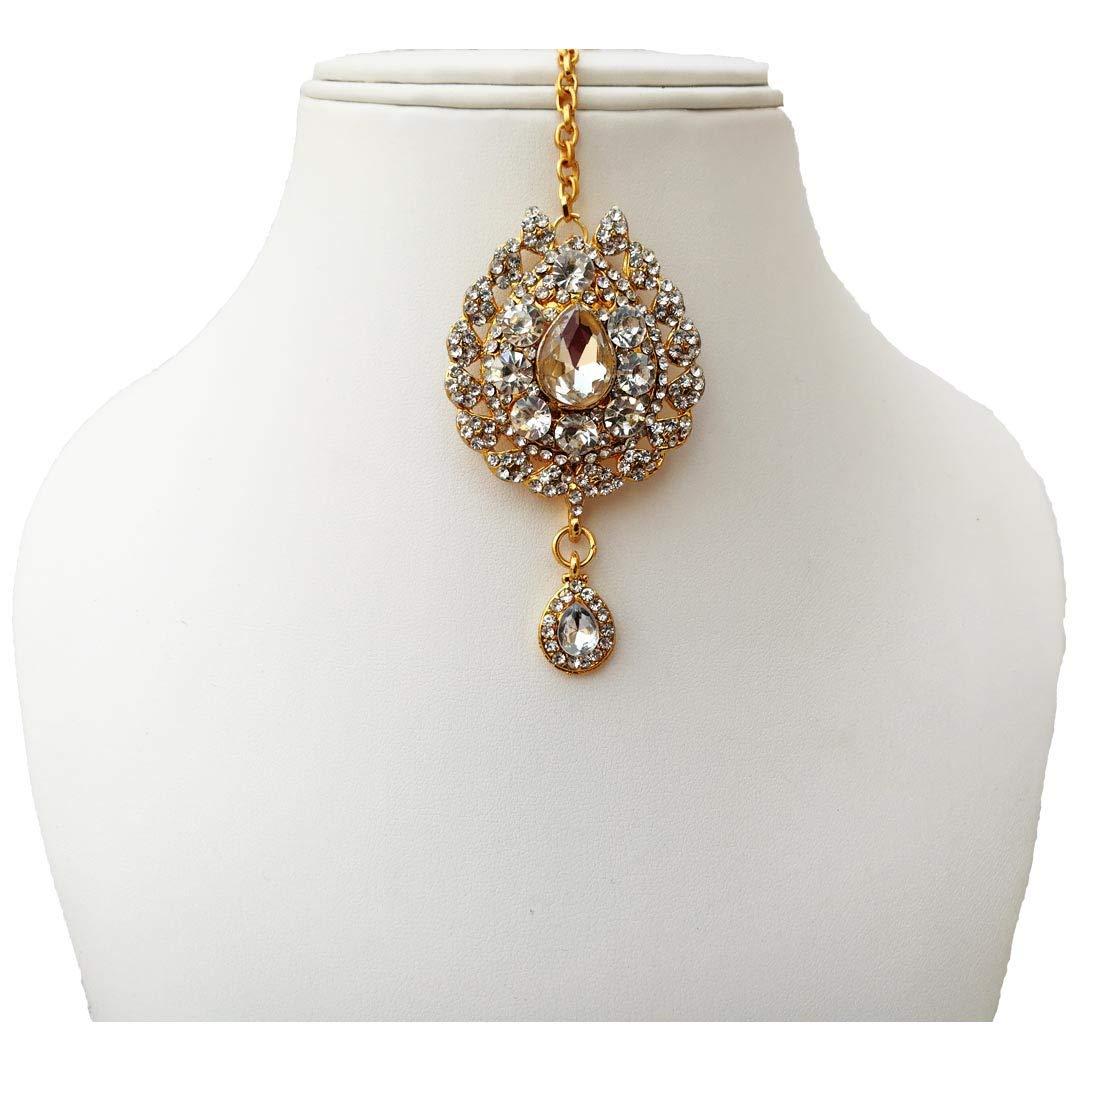 Fkraft Cubic Zirconia Latest Wedding Maang Tikka Jewelry Set Women Self Handmade FTS-WHT021G